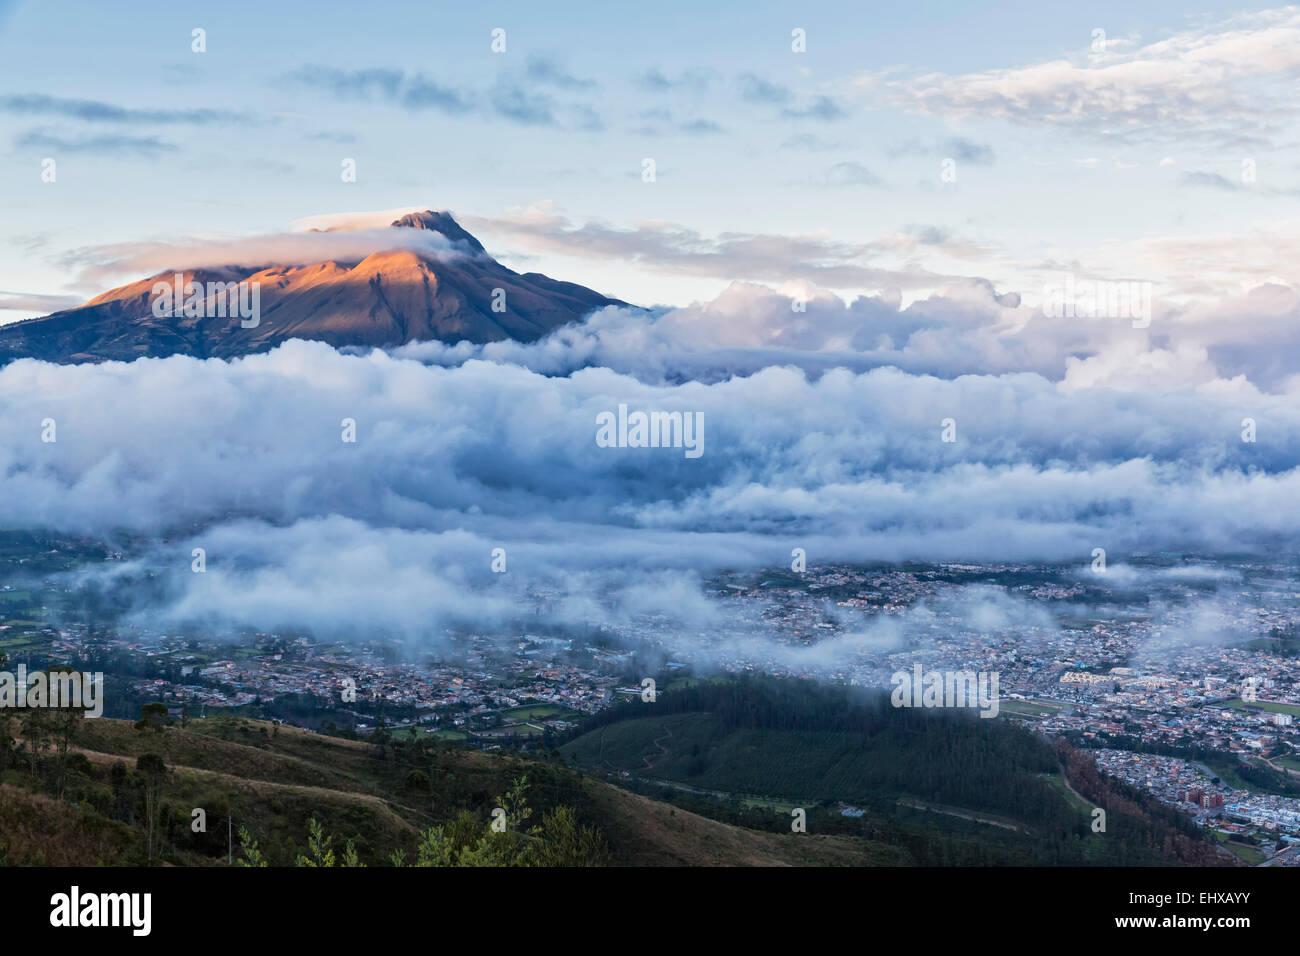 South America, Ecudador, Imbabura Province, Ibarra, Imbabura Volcano and fog in the morning - Stock Image